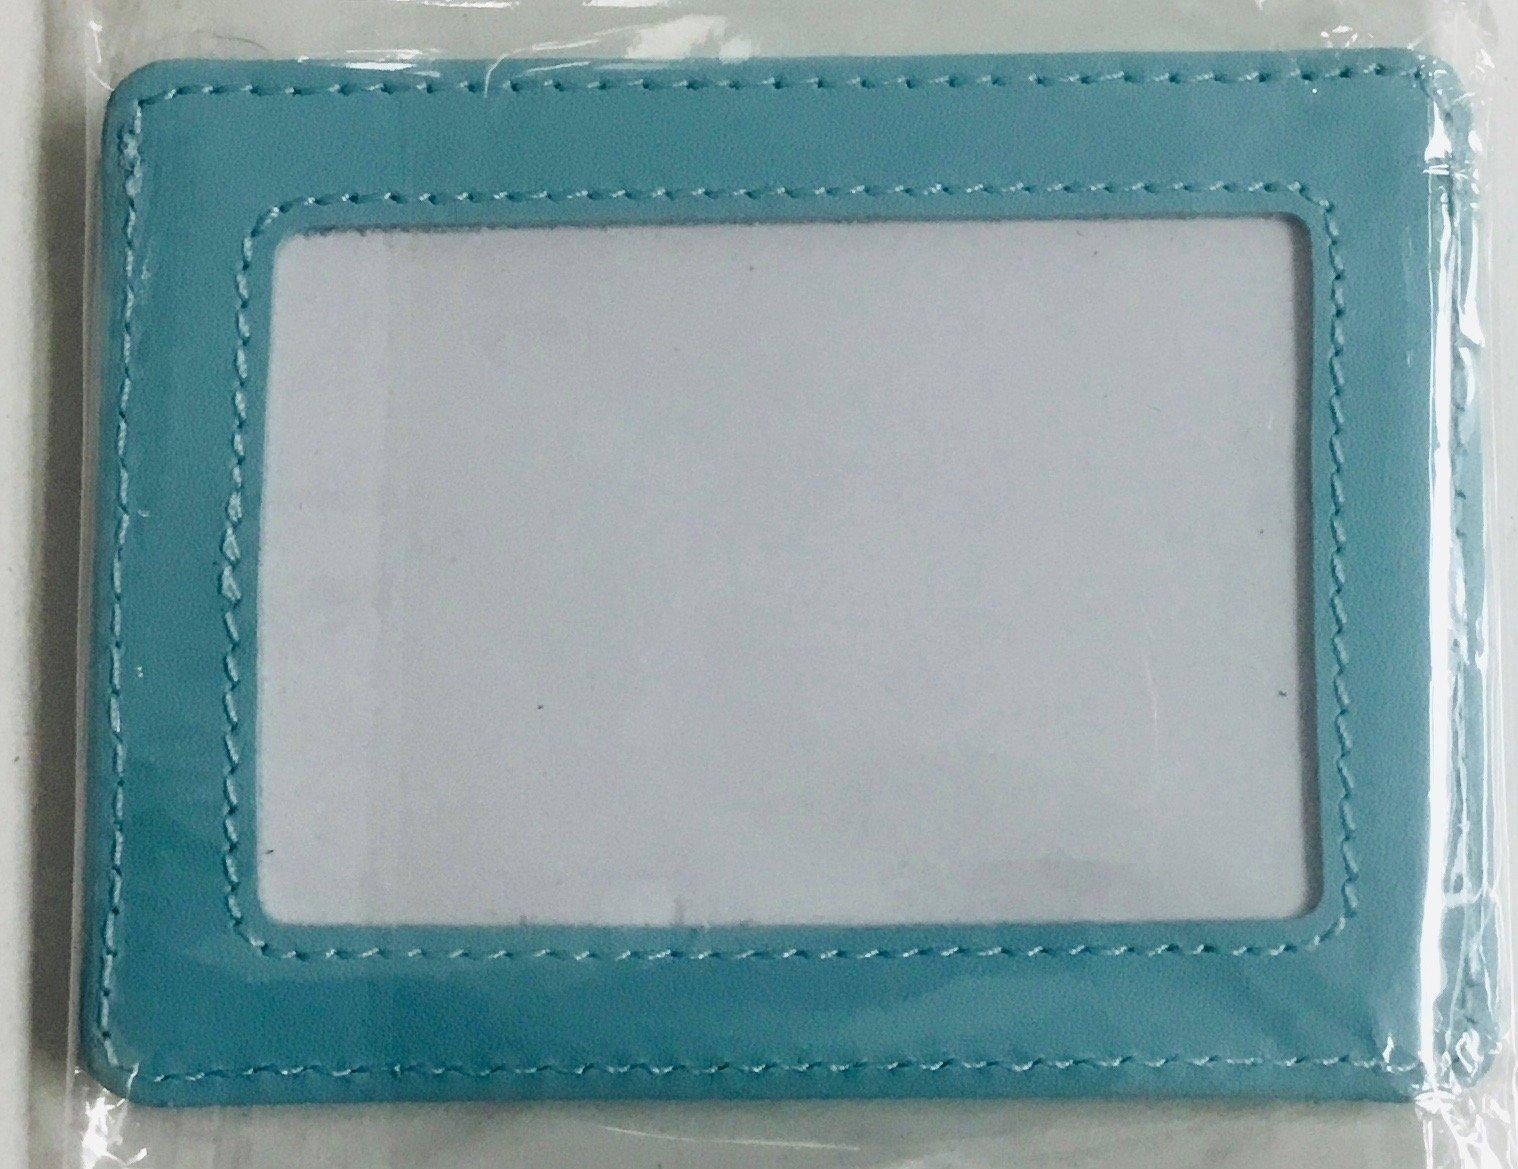 AQUA LEATHER CREDIT CARD CASE , SELF-FINISHING, 3X2 OPENING